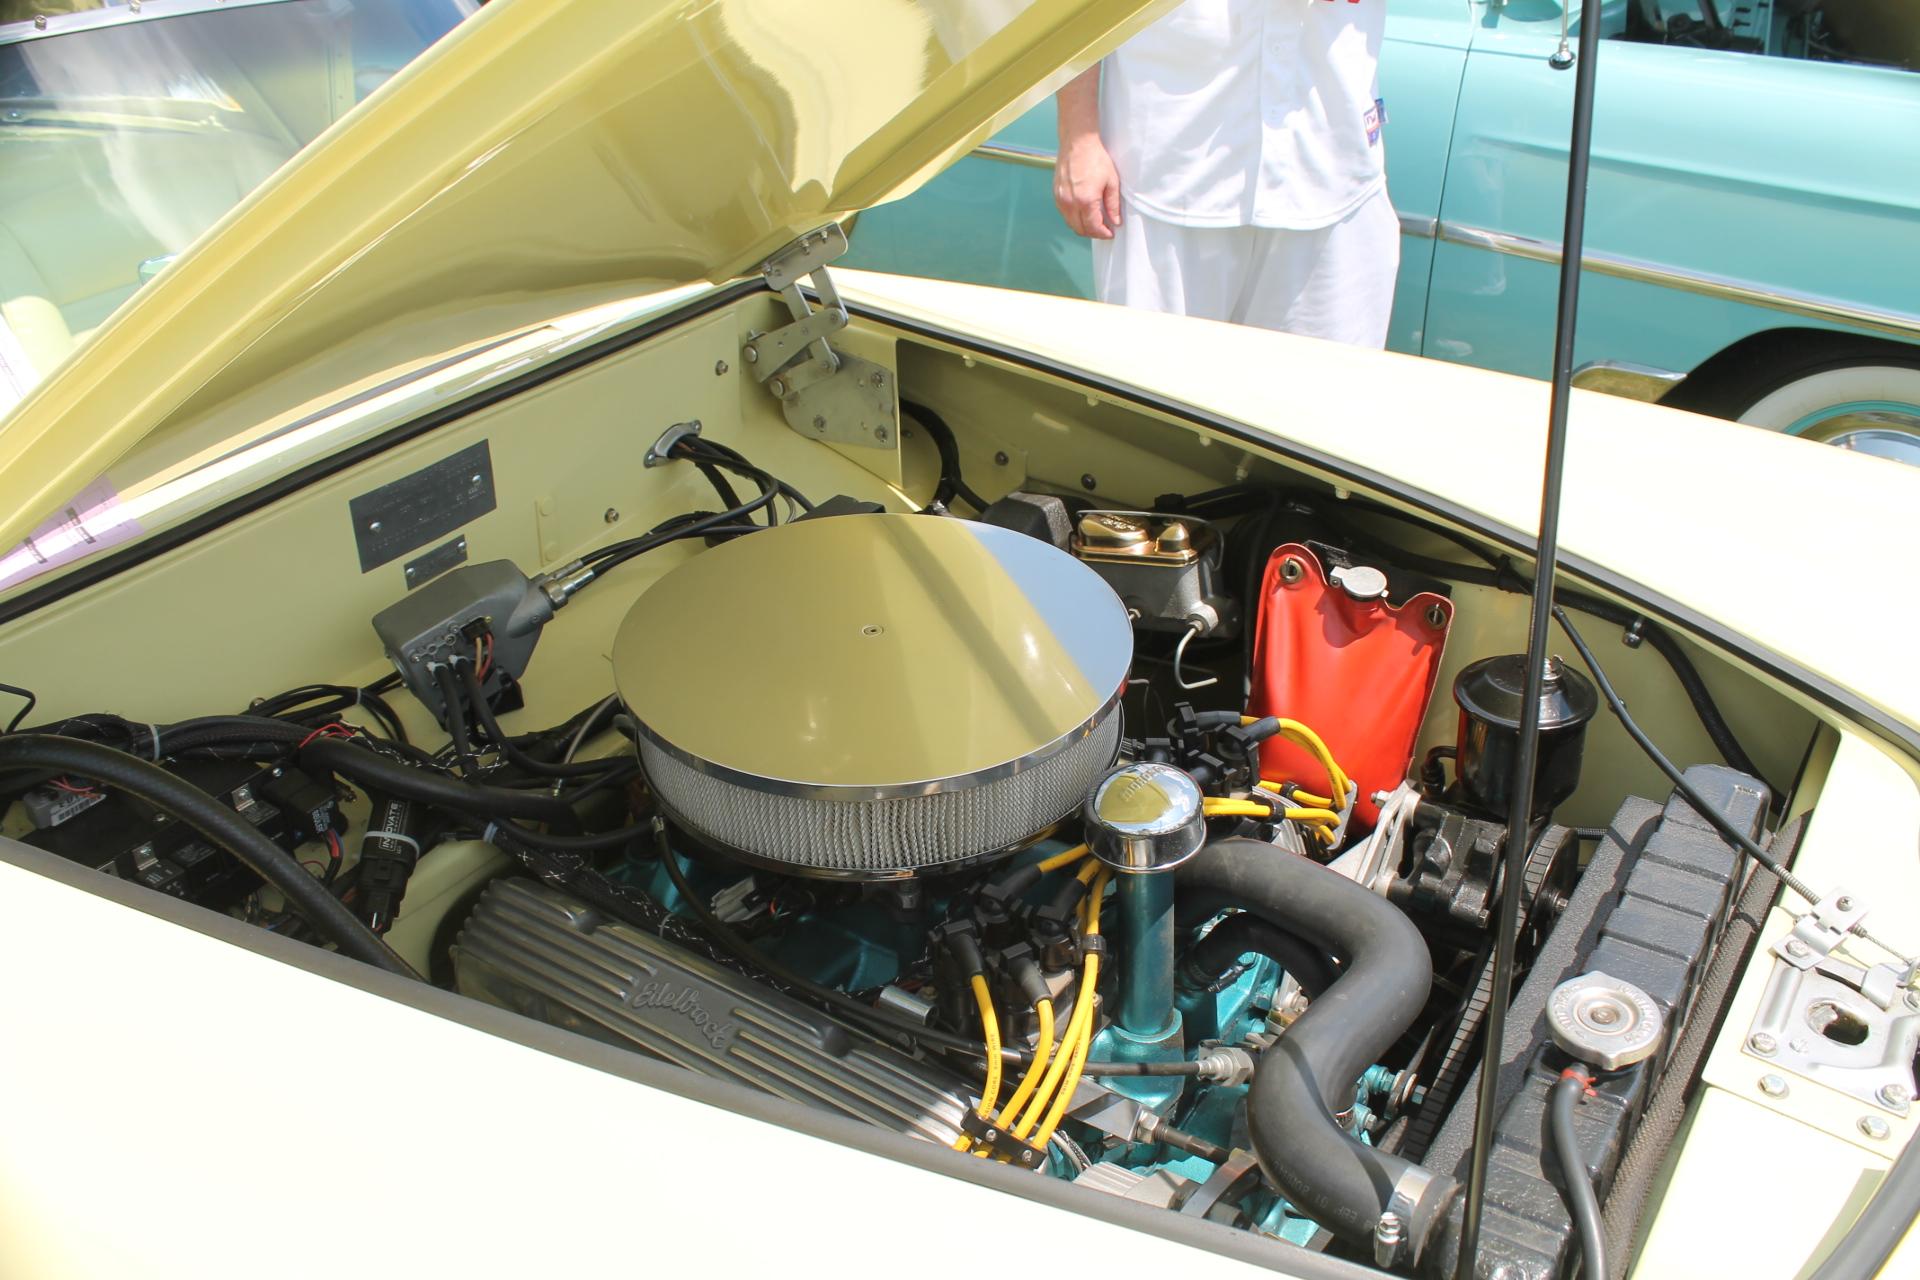 Kaiser Darrin Wiring Diagram Electrical Diagrams Jeep 1954 Americas First Fiberglass Sports Car Oldsmobile 88